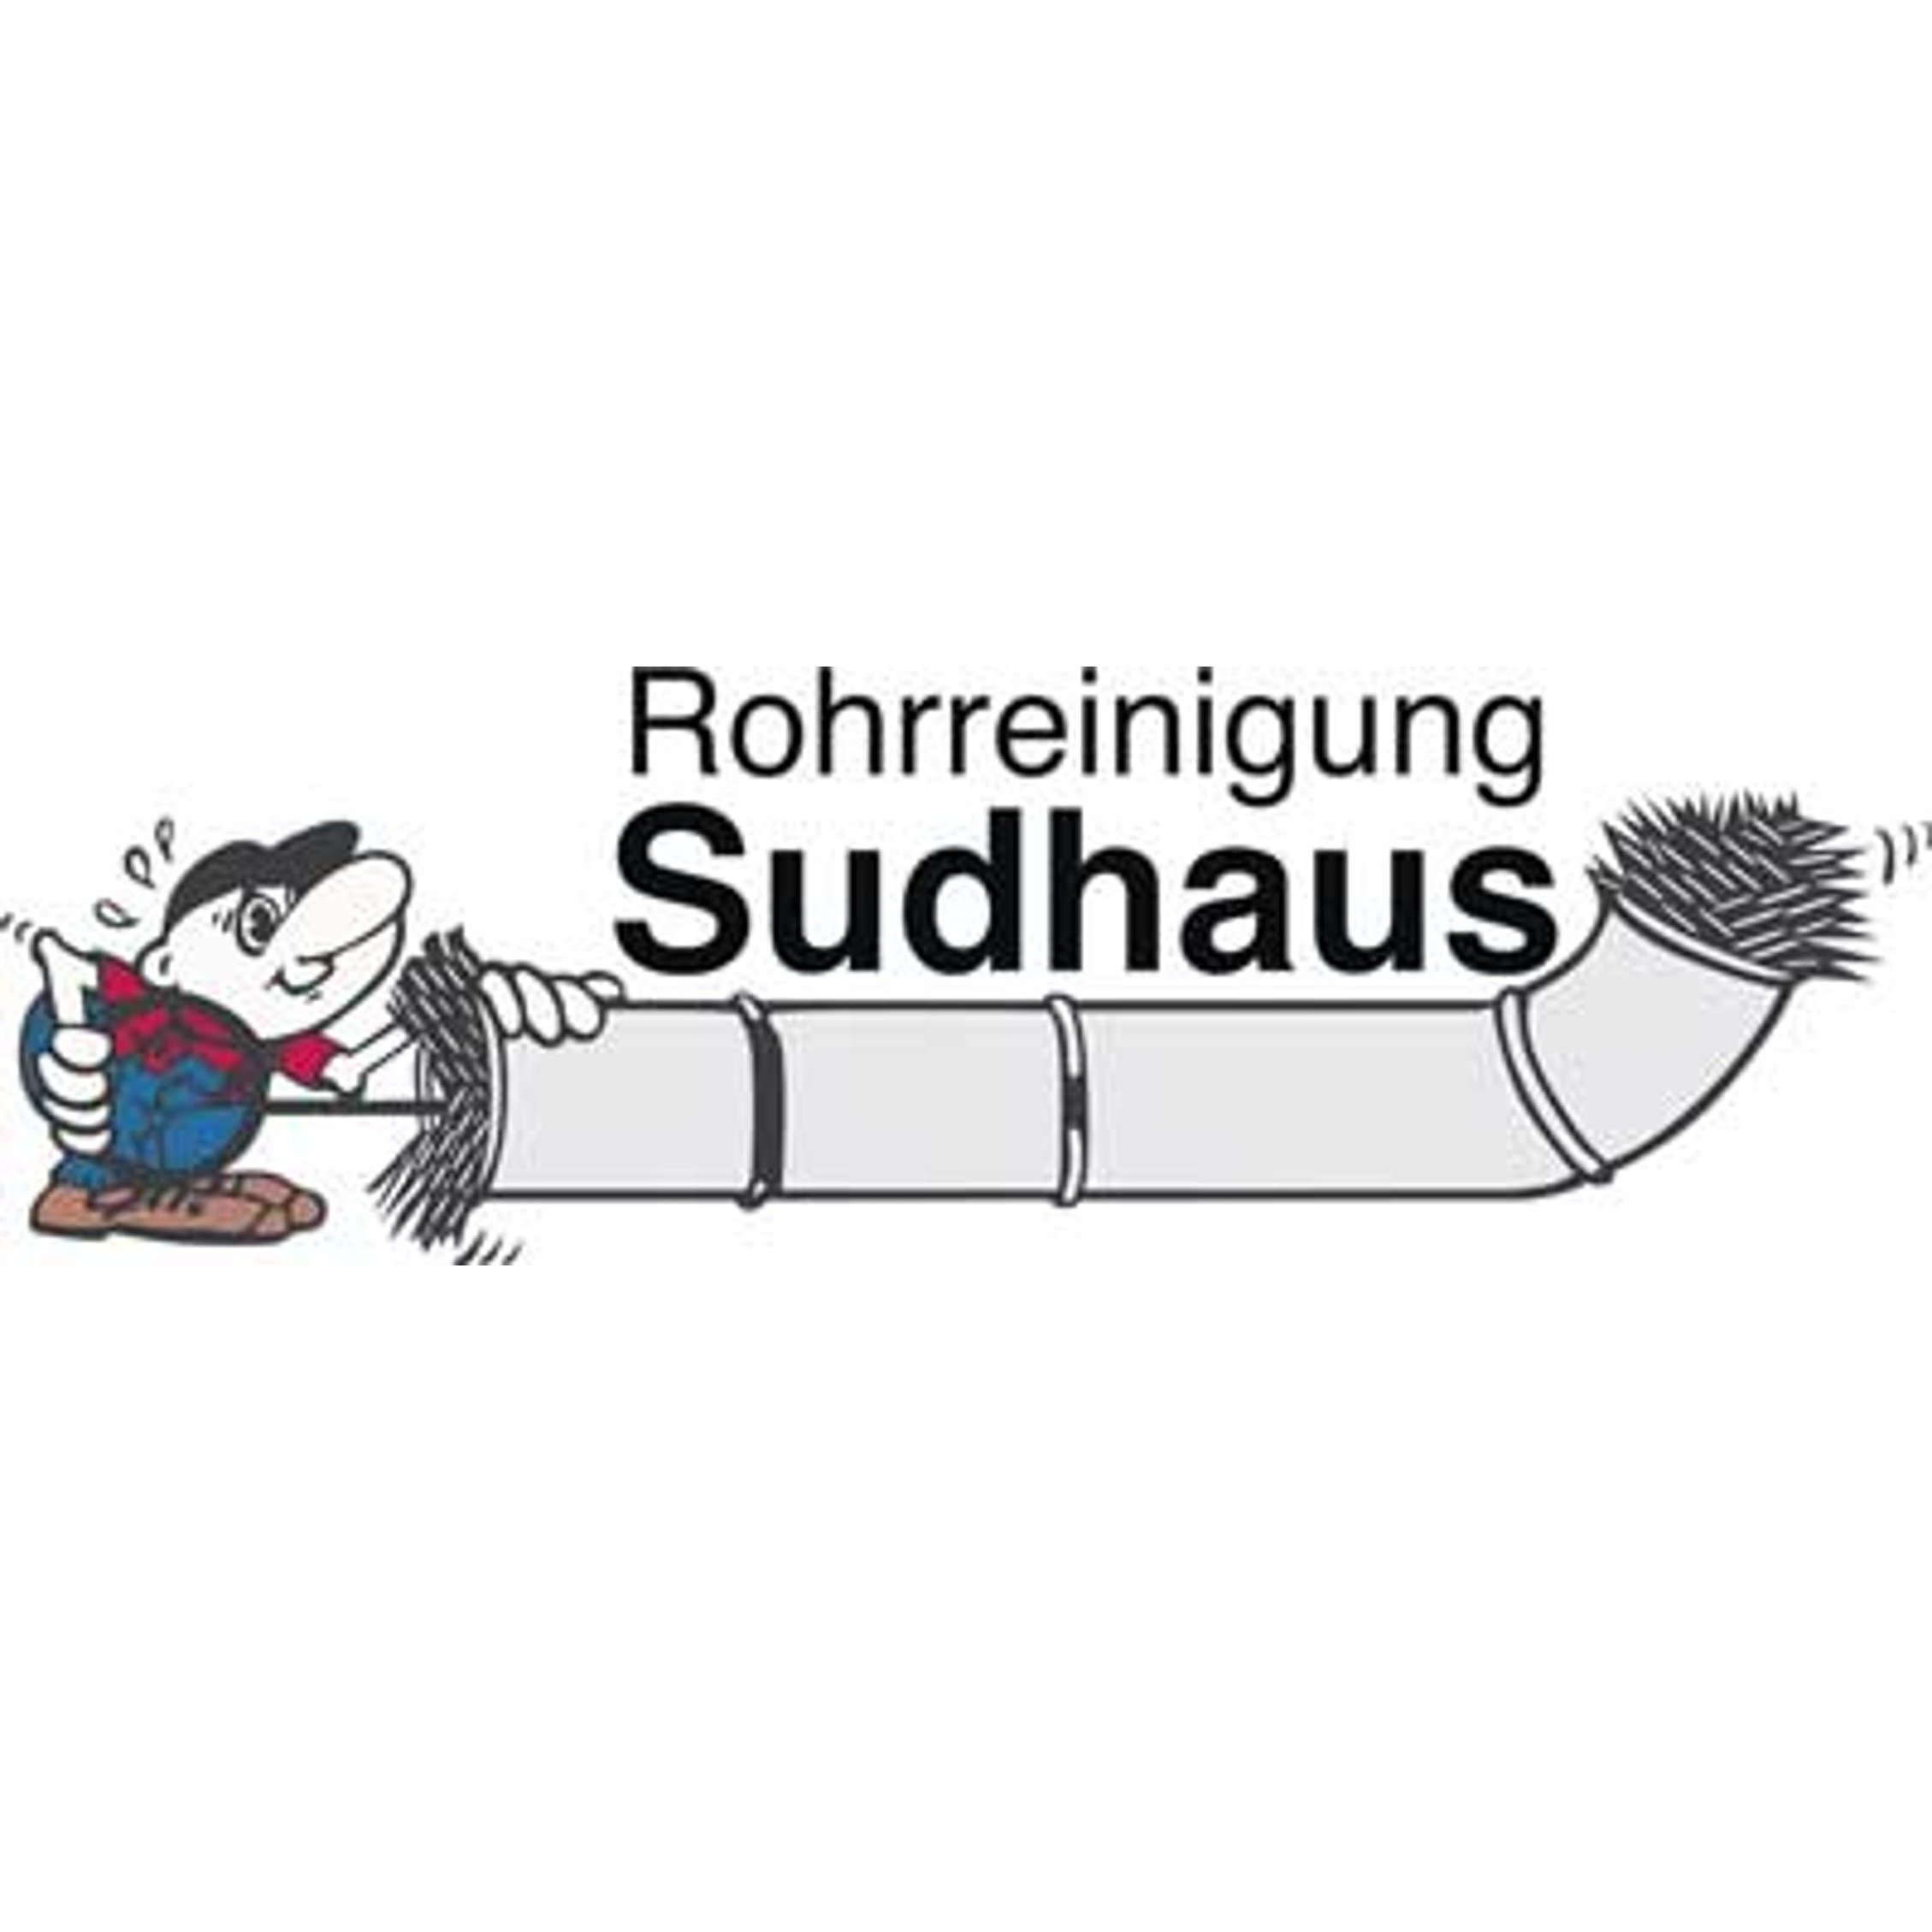 Rohrreinigung Sudhaus